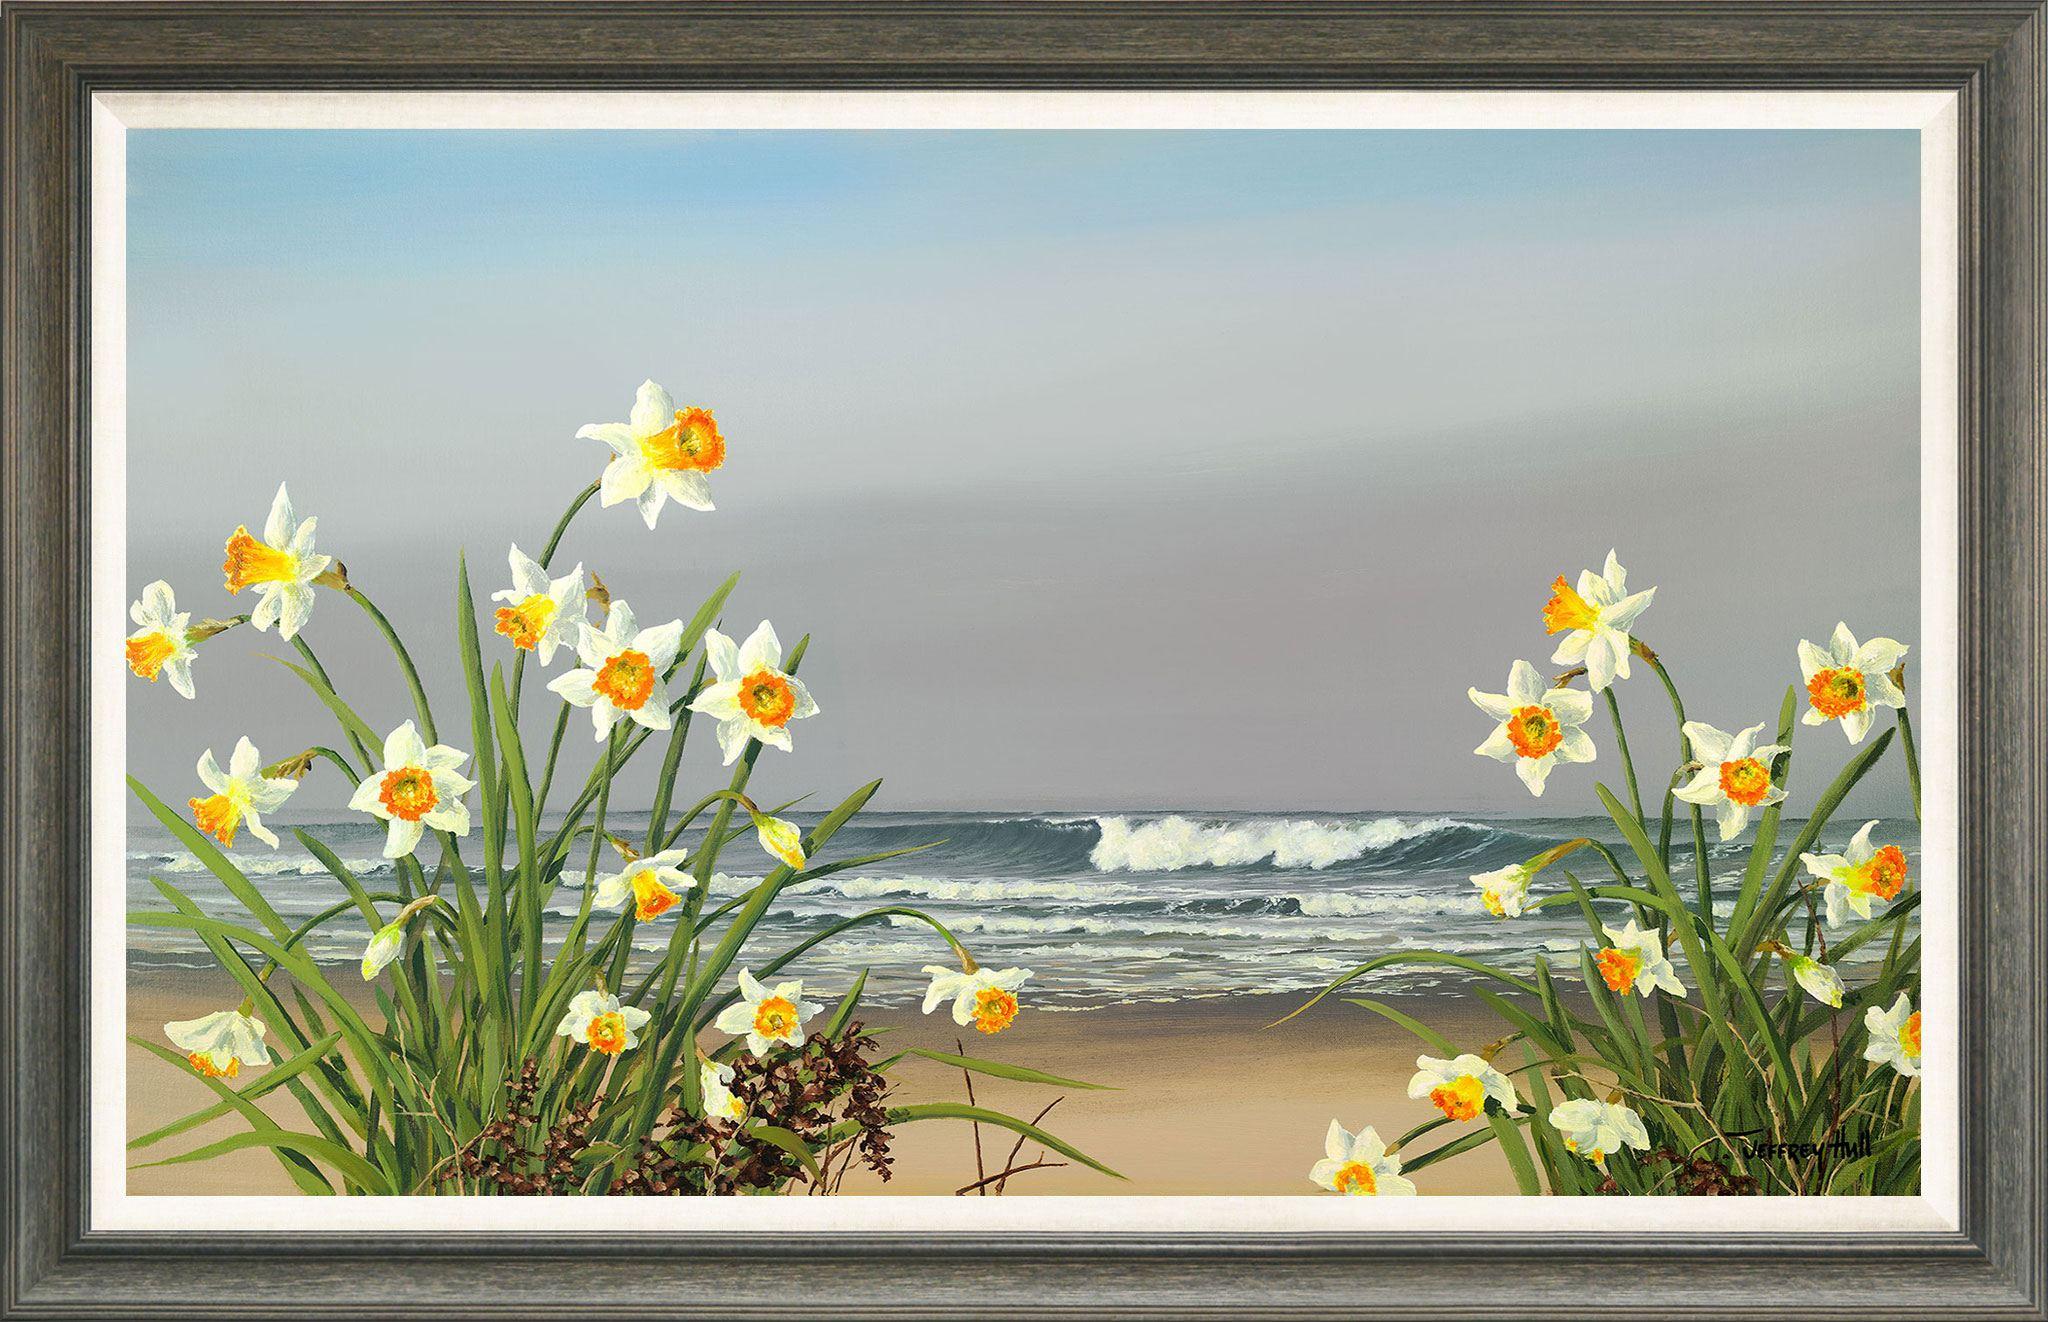 Shoreline-Daffodils-LimEd-Cascade-White-Liner-4-Website-2021